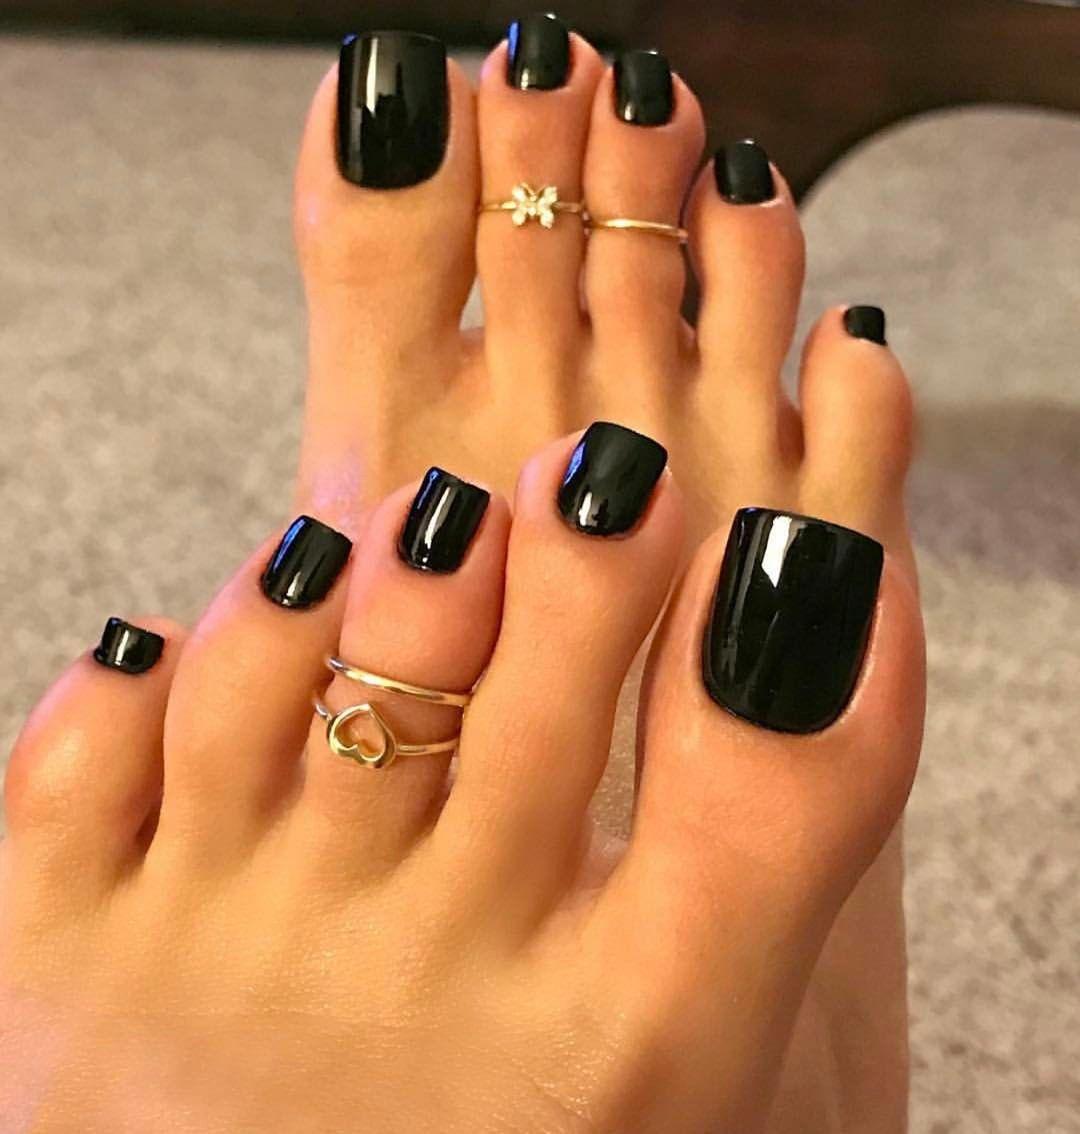 Trust In Black Nail Design Summer And Matching Toenails Long Toenails Pretty Toe Nails Acrylic Toes